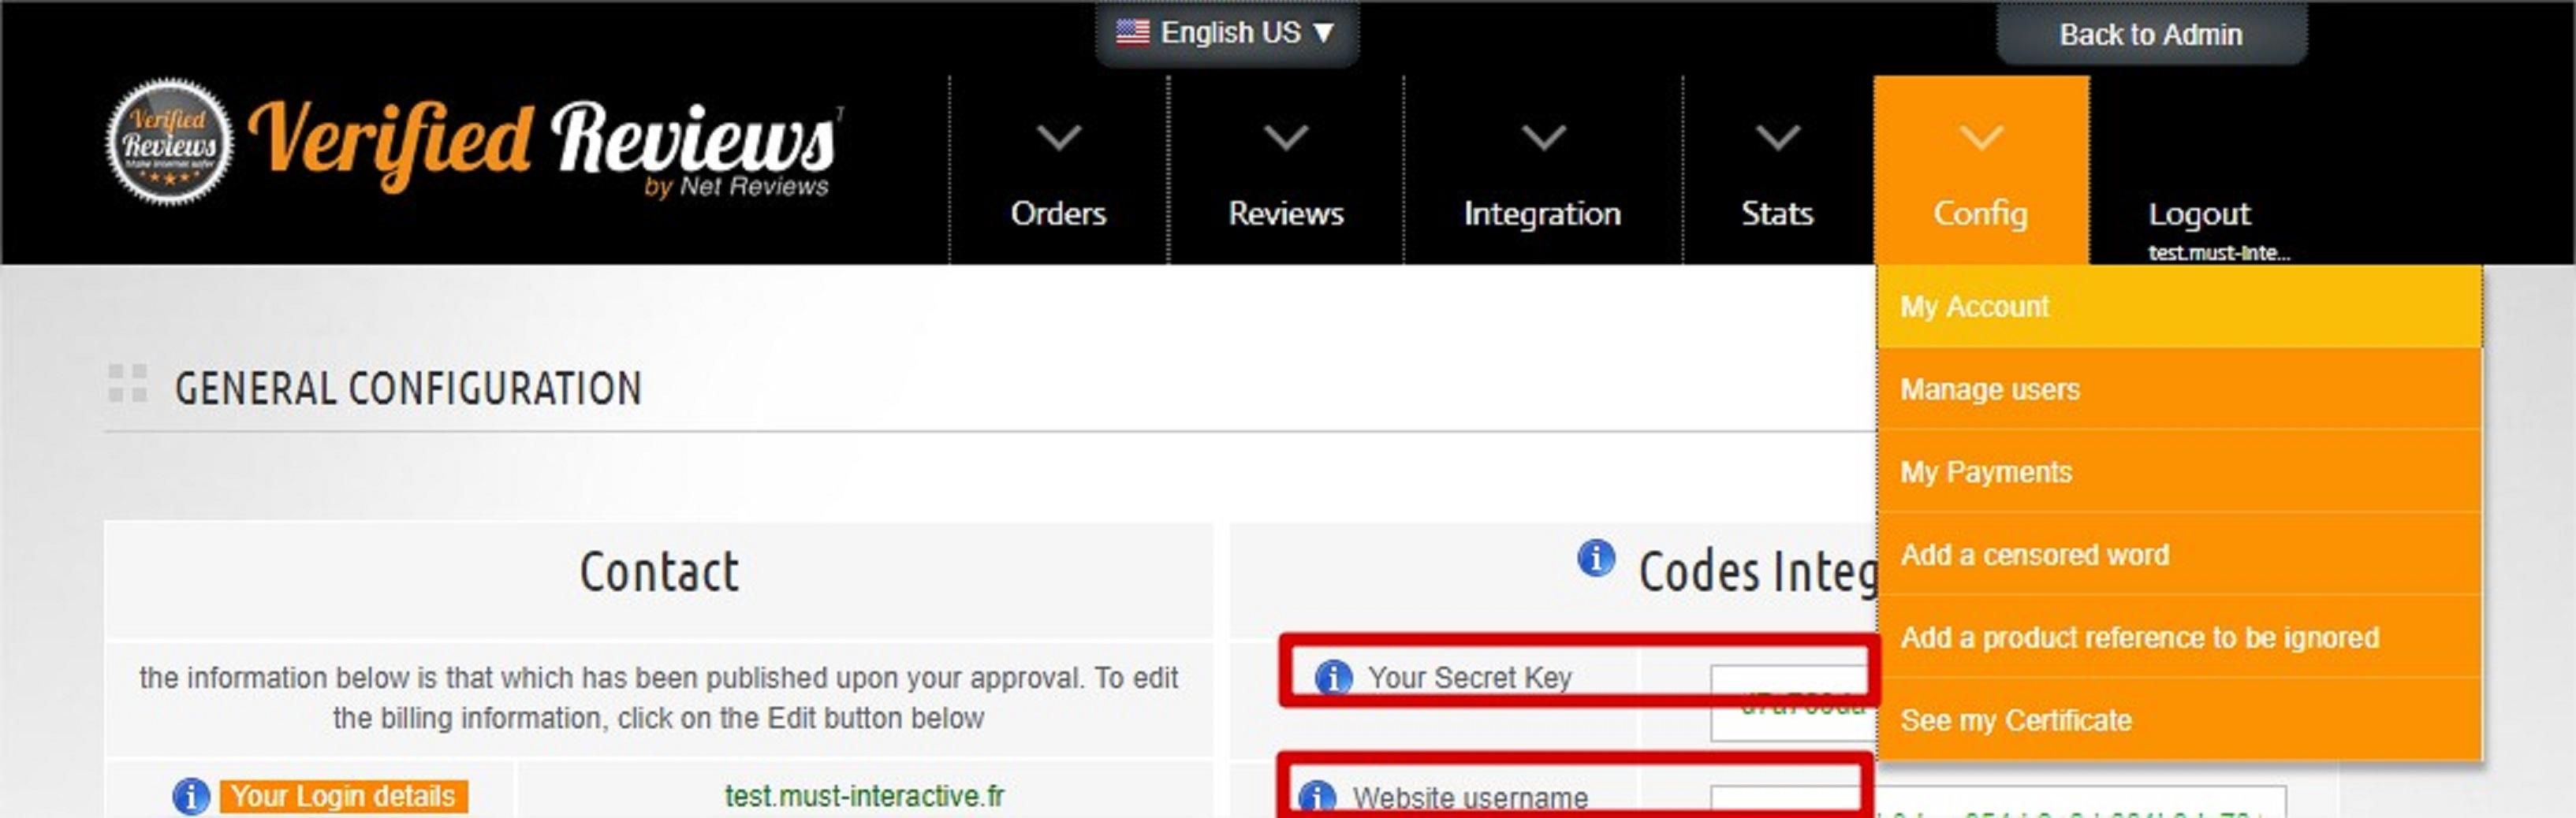 Verified Reviews API Key in account